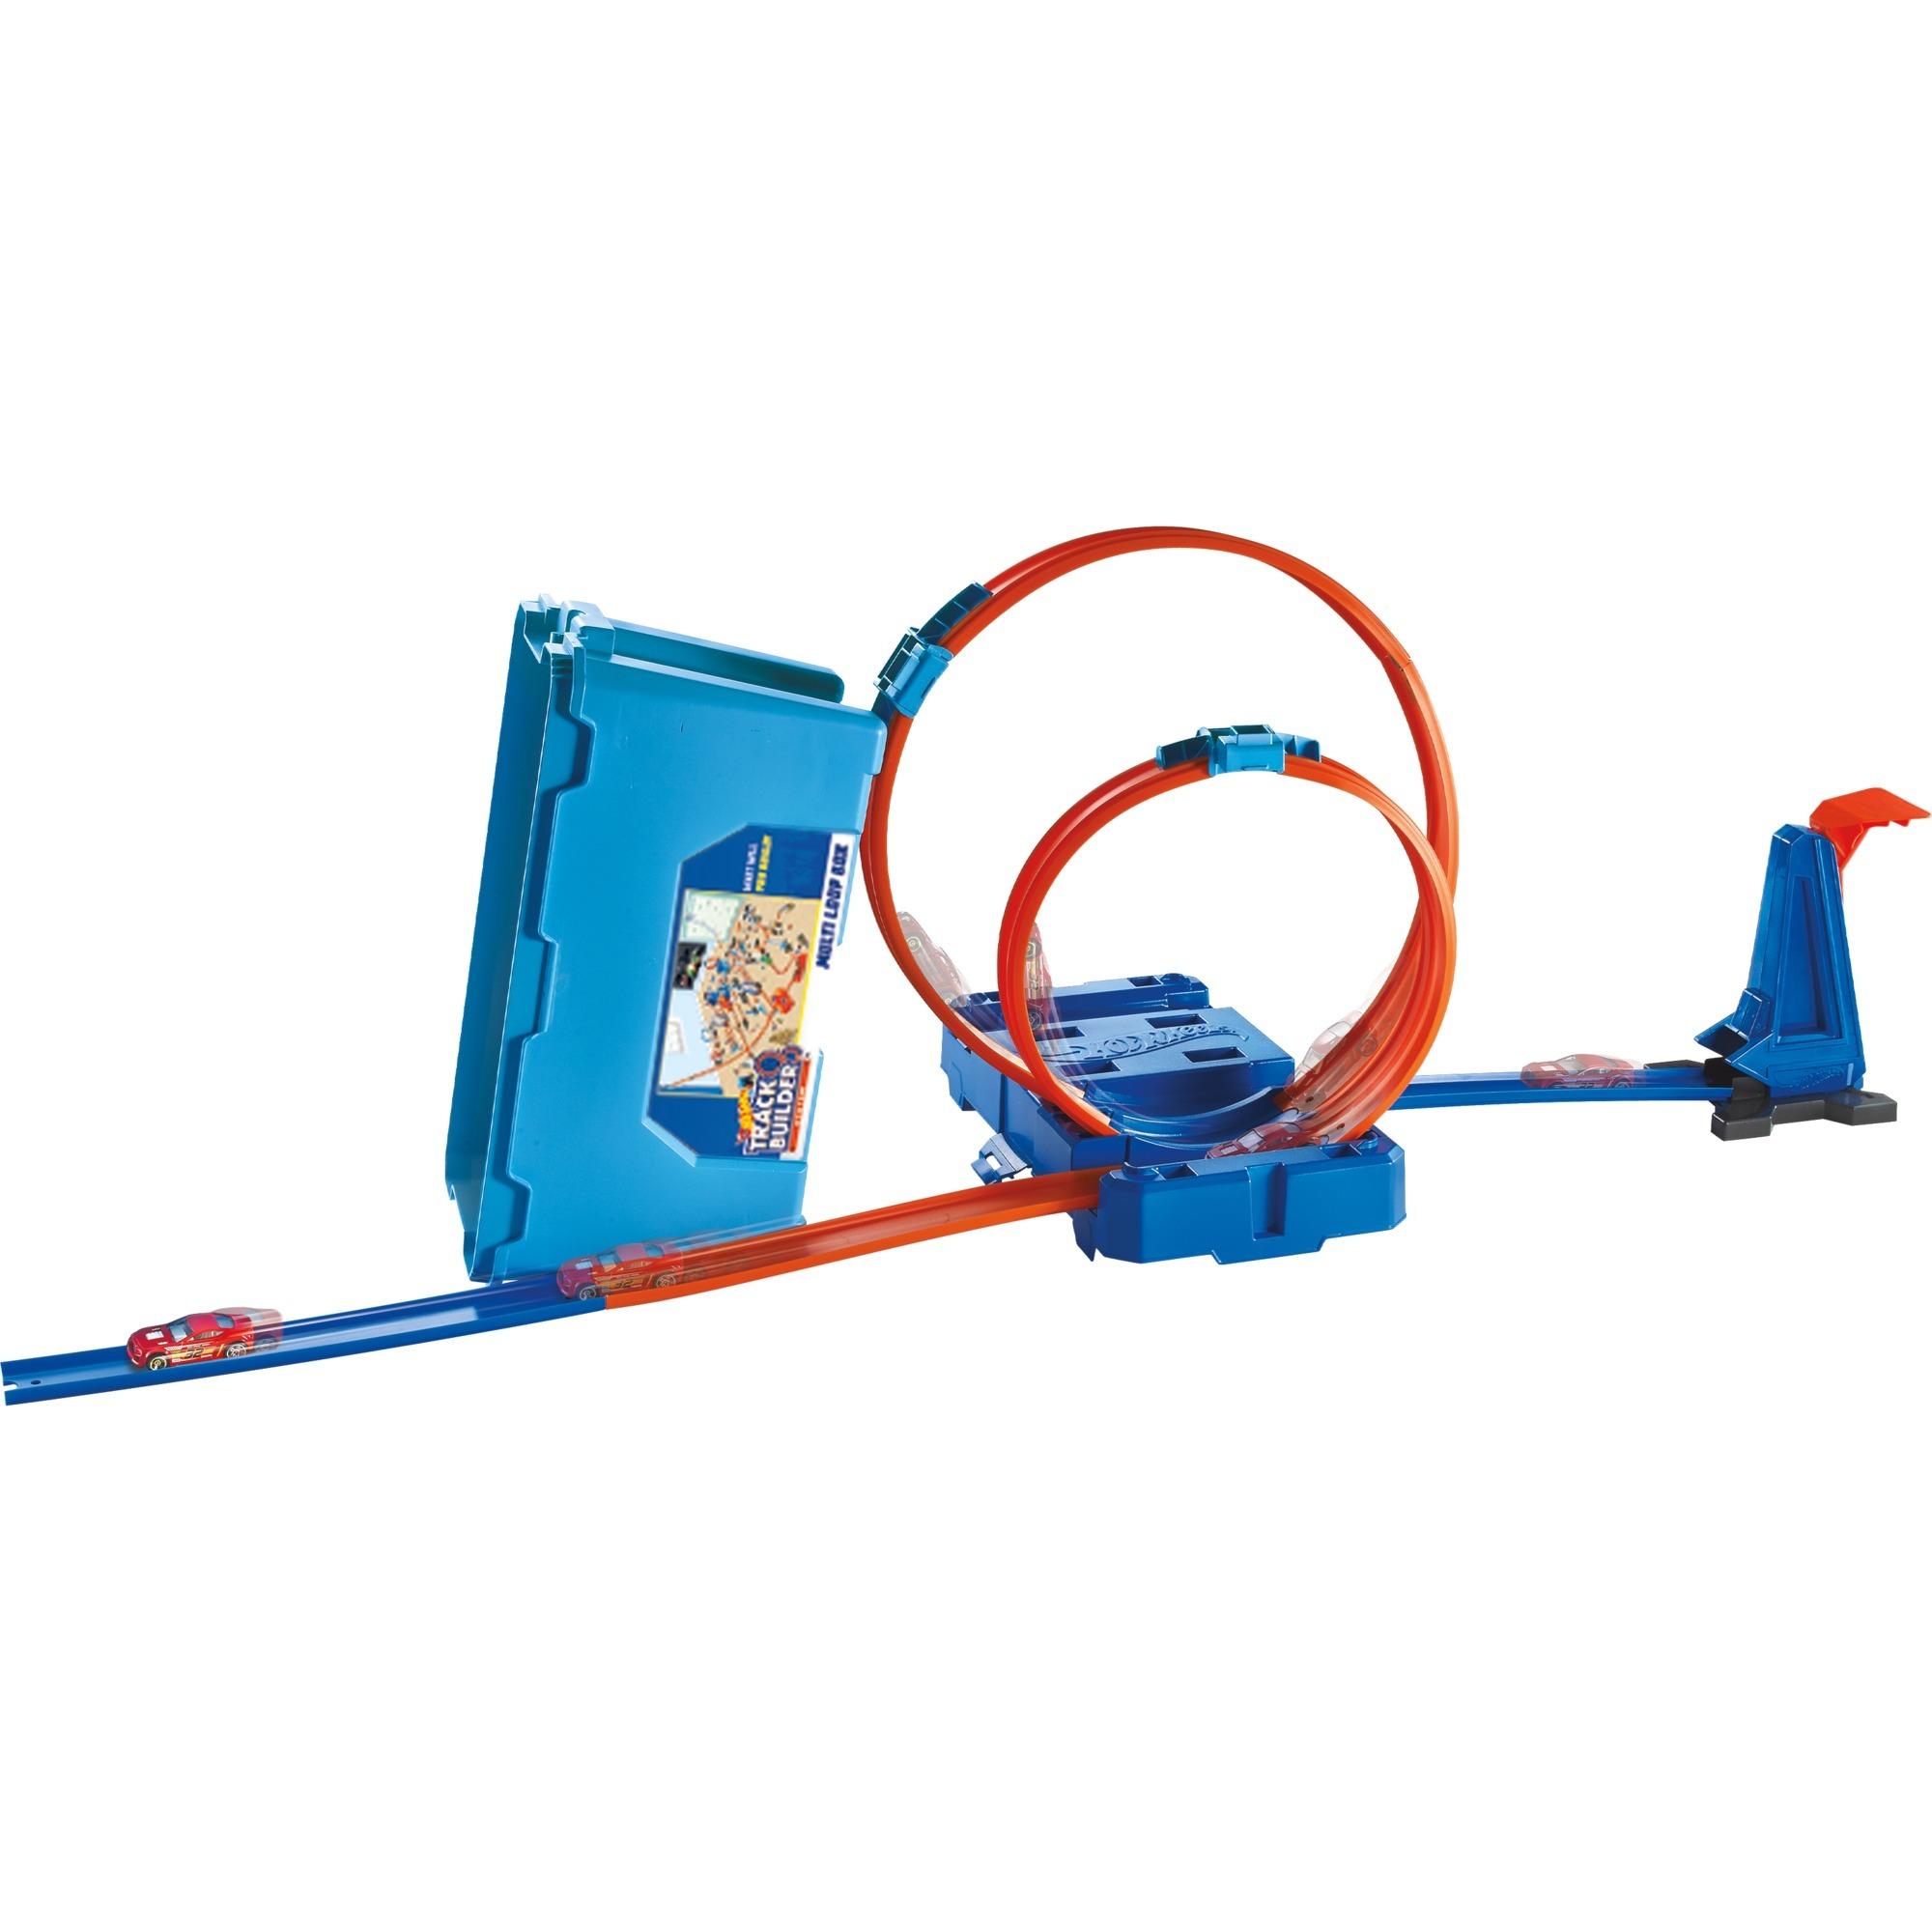 Hot Wheels Track Builder Super Multi Looping Box Rennbahn Baut Siku